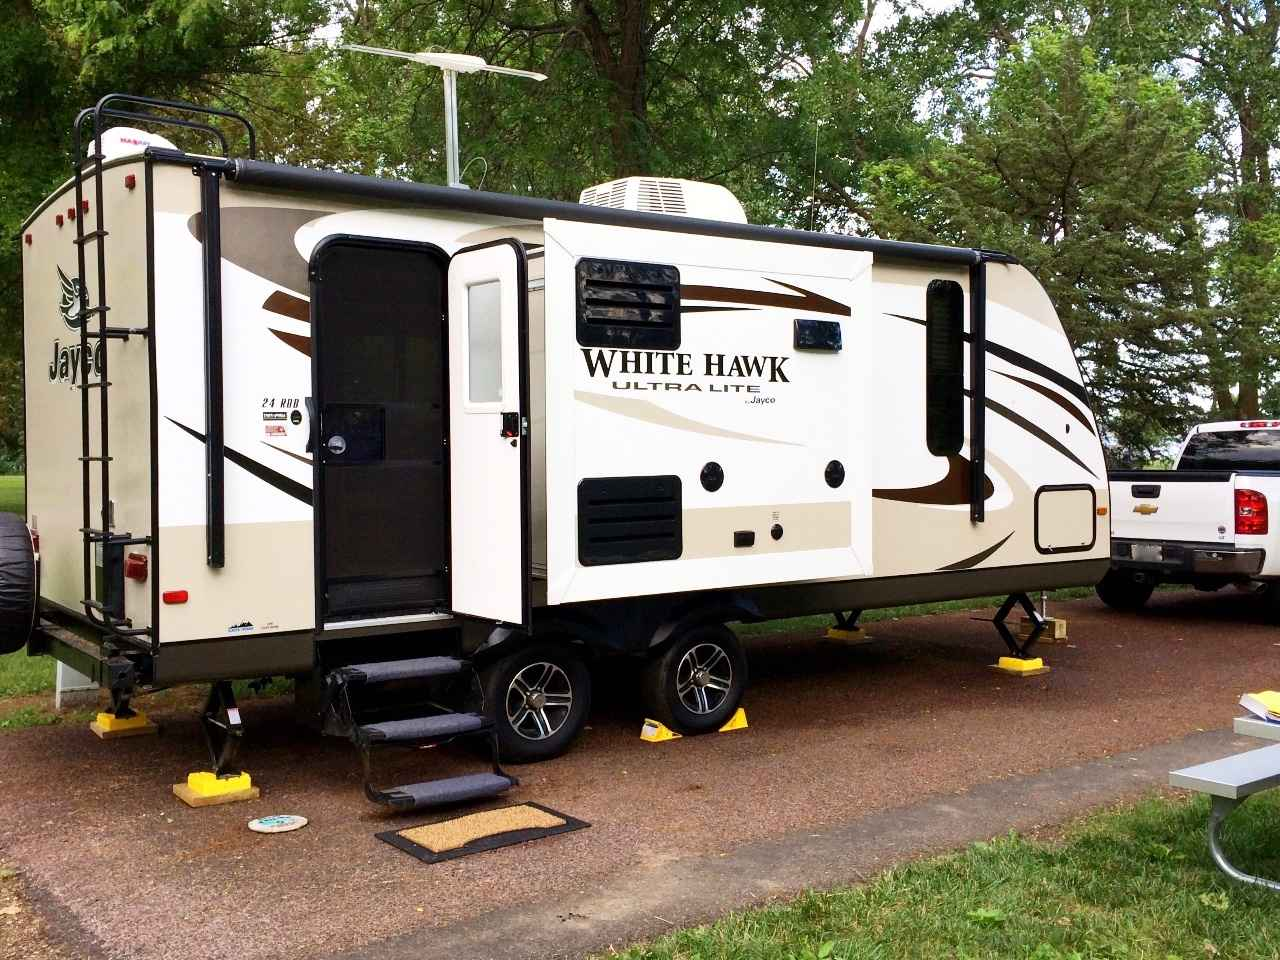 2015 used white hawk ultra lite travel trailer in nebraska ne. Black Bedroom Furniture Sets. Home Design Ideas